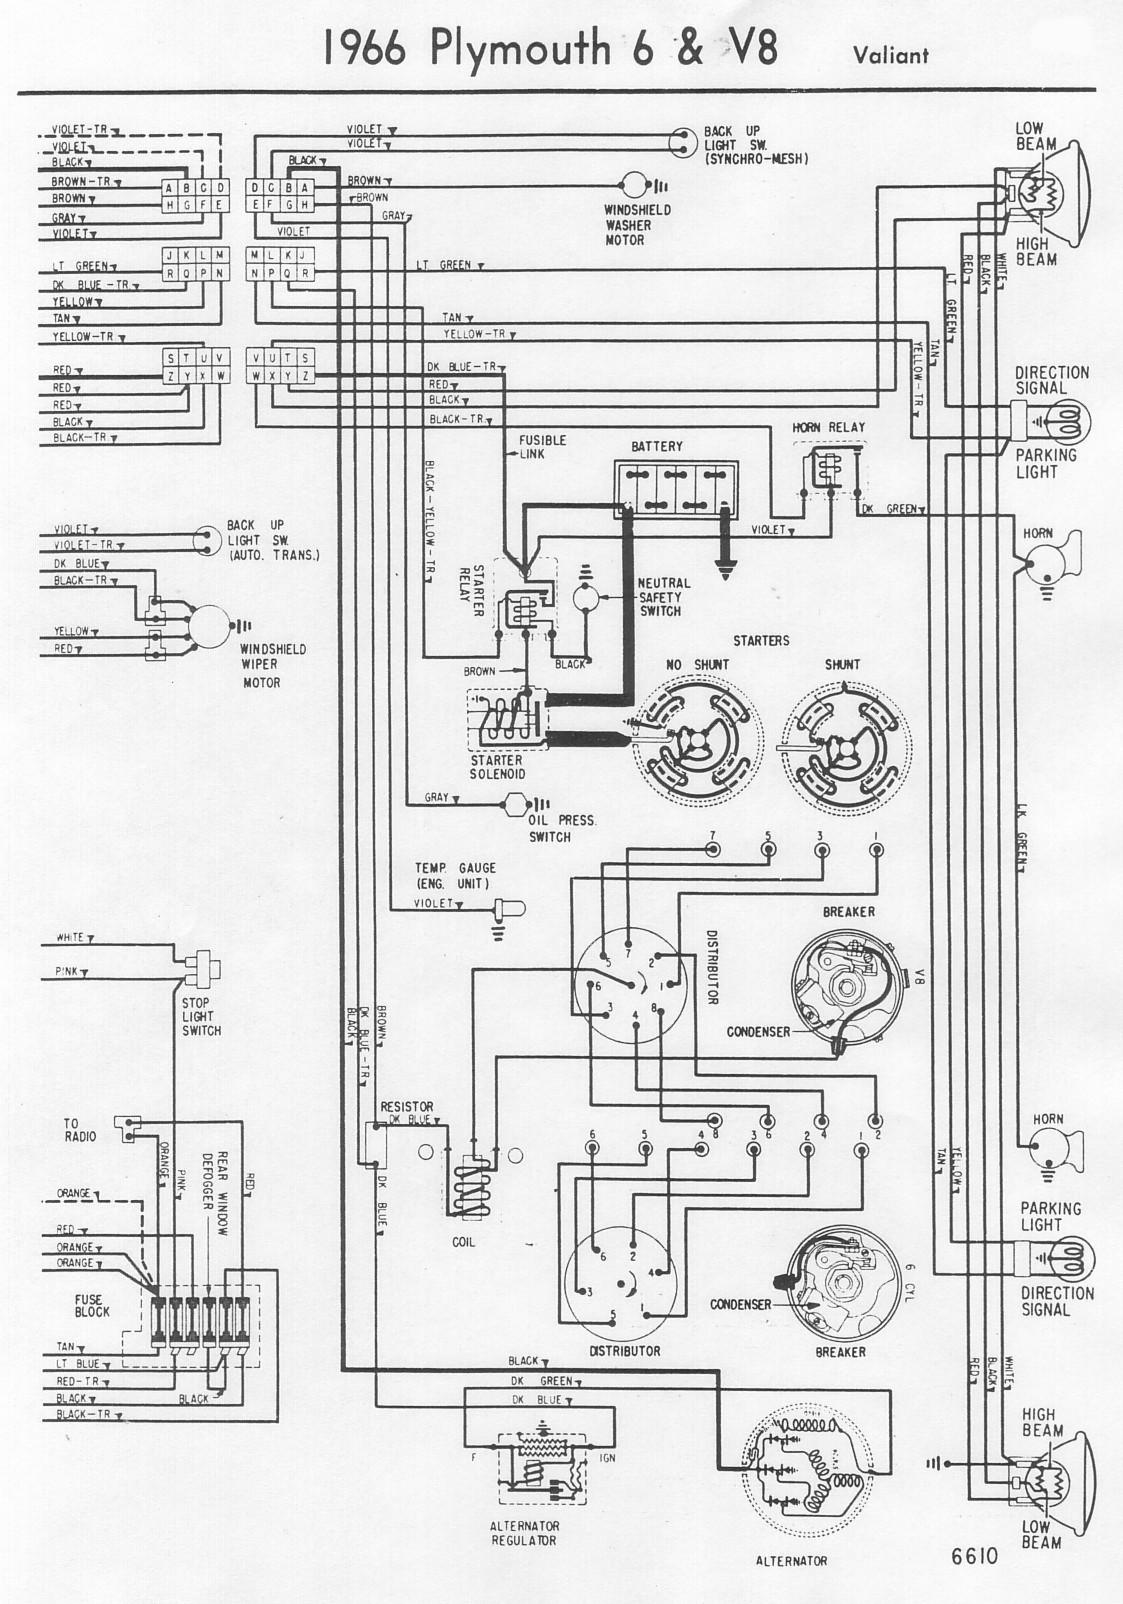 Surprising 2000 Honda 400ex Wiring Diagram Photos - Best Image Wire ...